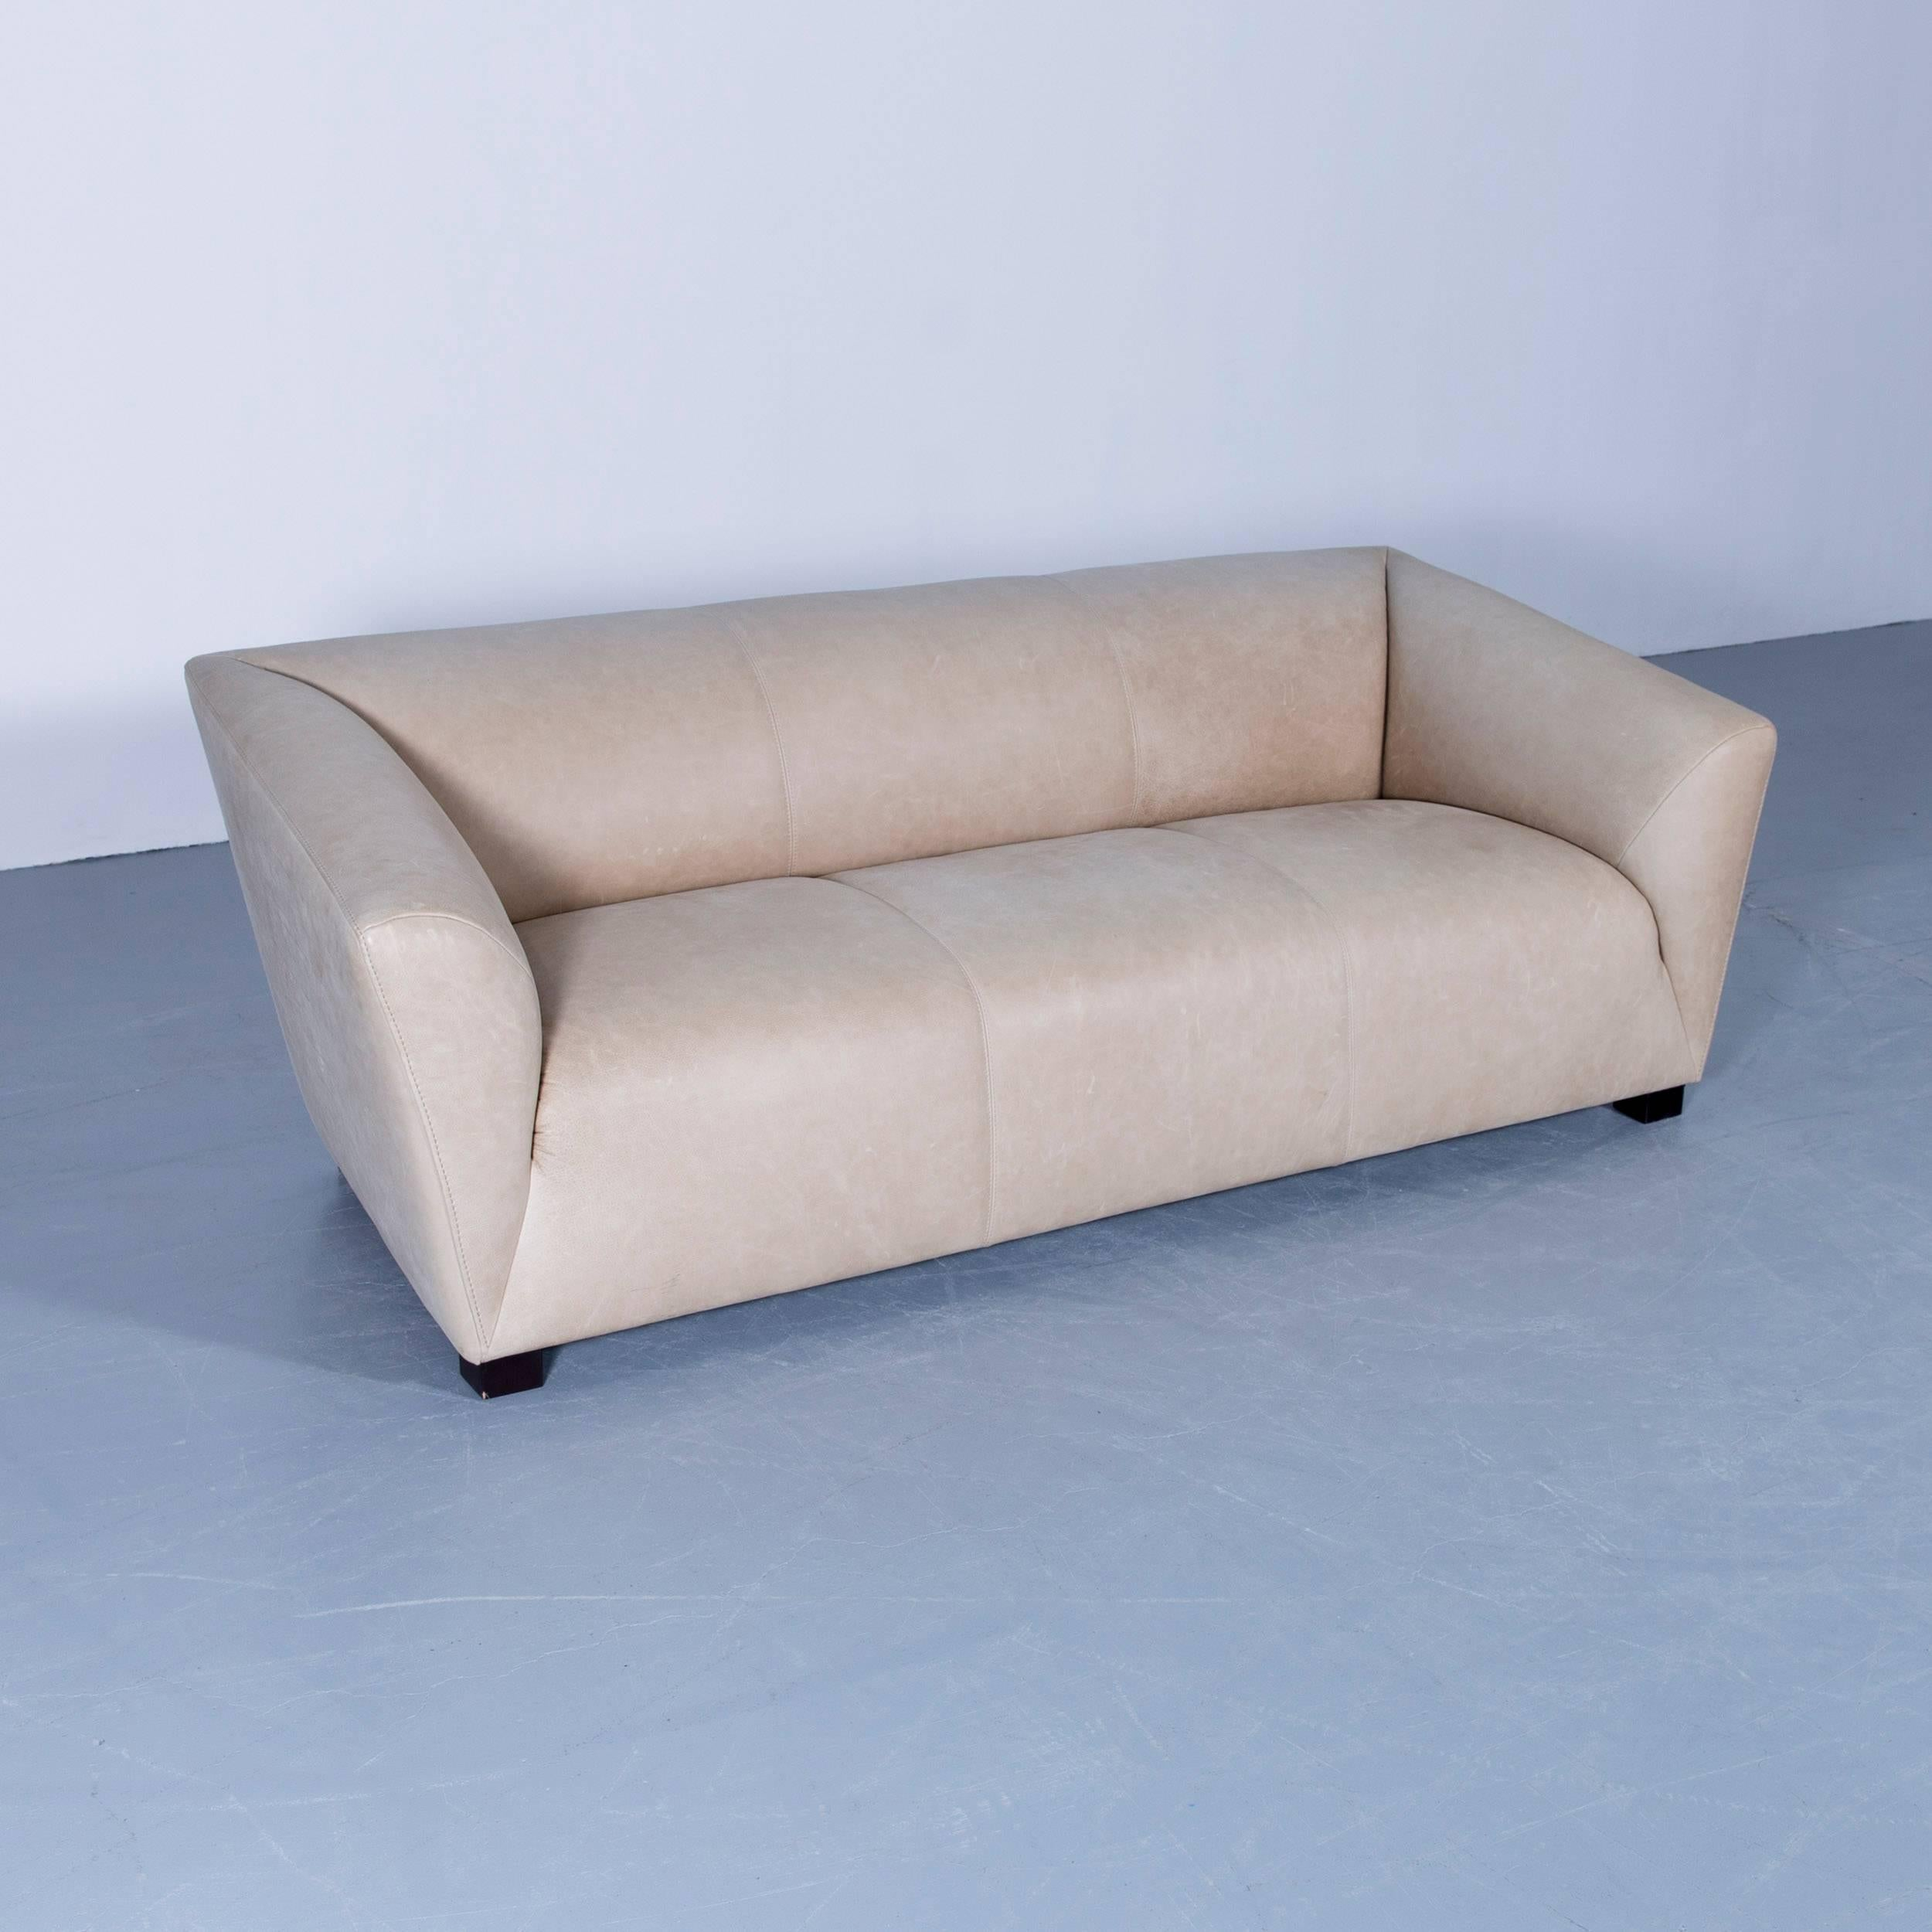 Machalke Theo Designer Sofa Anilin Leather Beige Brown Three Seat Couch  Modern In Good Condition